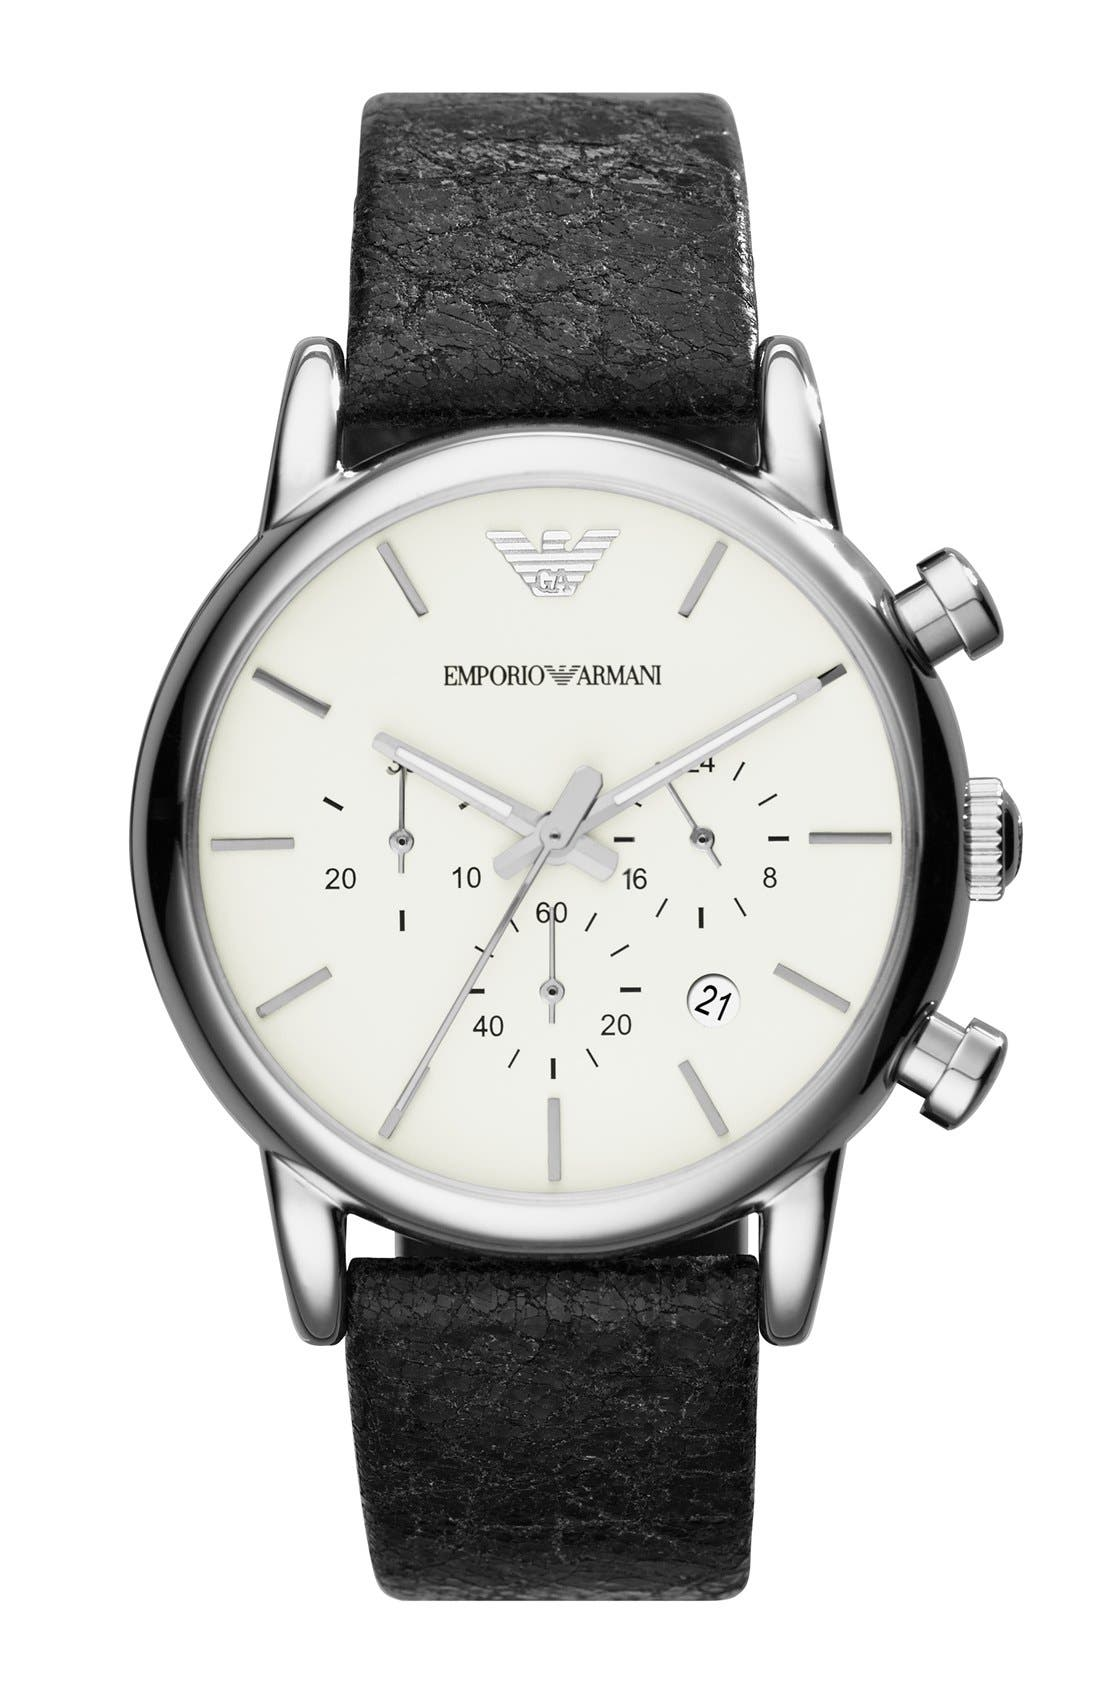 Main Image - Emporio Armani Chronograph Leather Strap Watch, 41mm